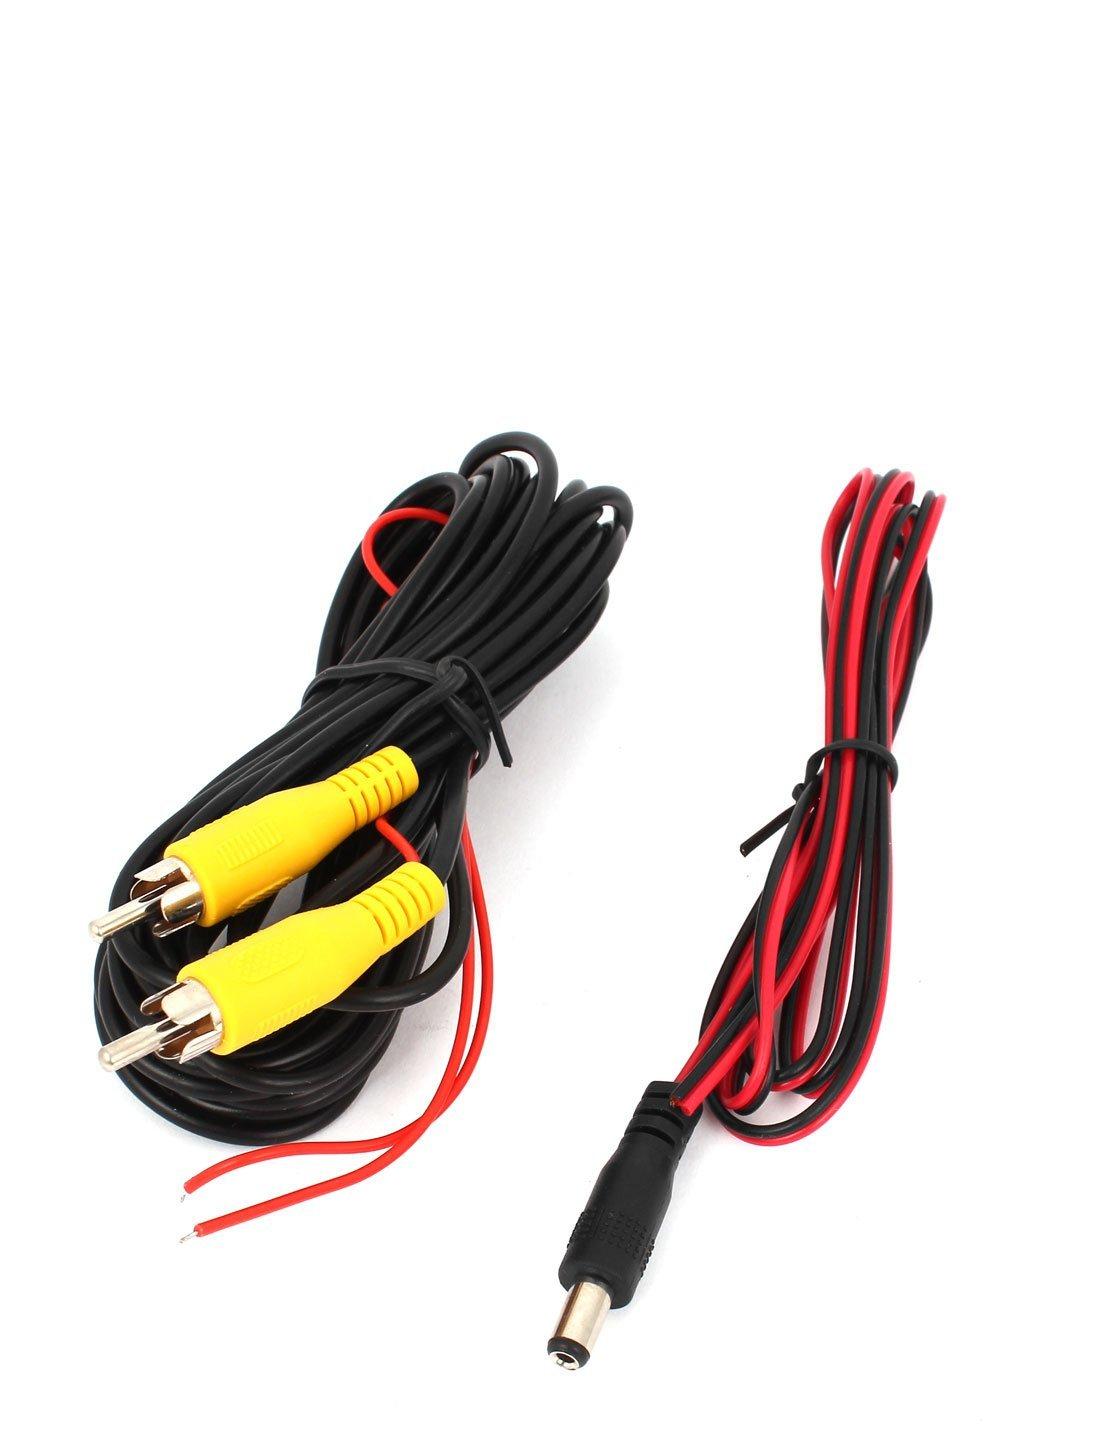 Amazon.com: Impermeable opinión posterior del coche del CCD de la cámara del revés w 4 LED Blanco: Car Electronics